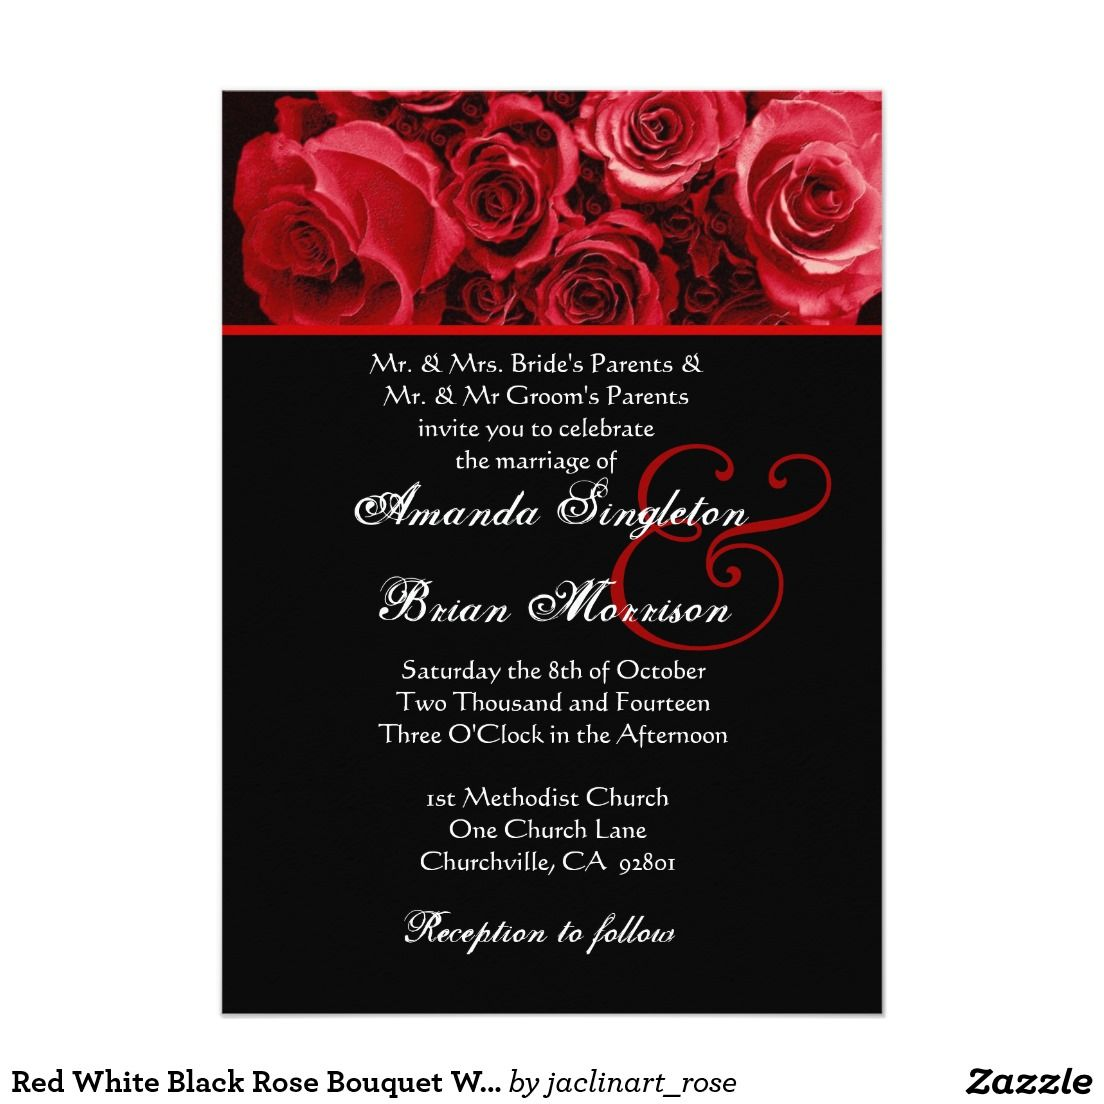 Red White Black Rose Bouquet Wedding Invitation | wedding ...